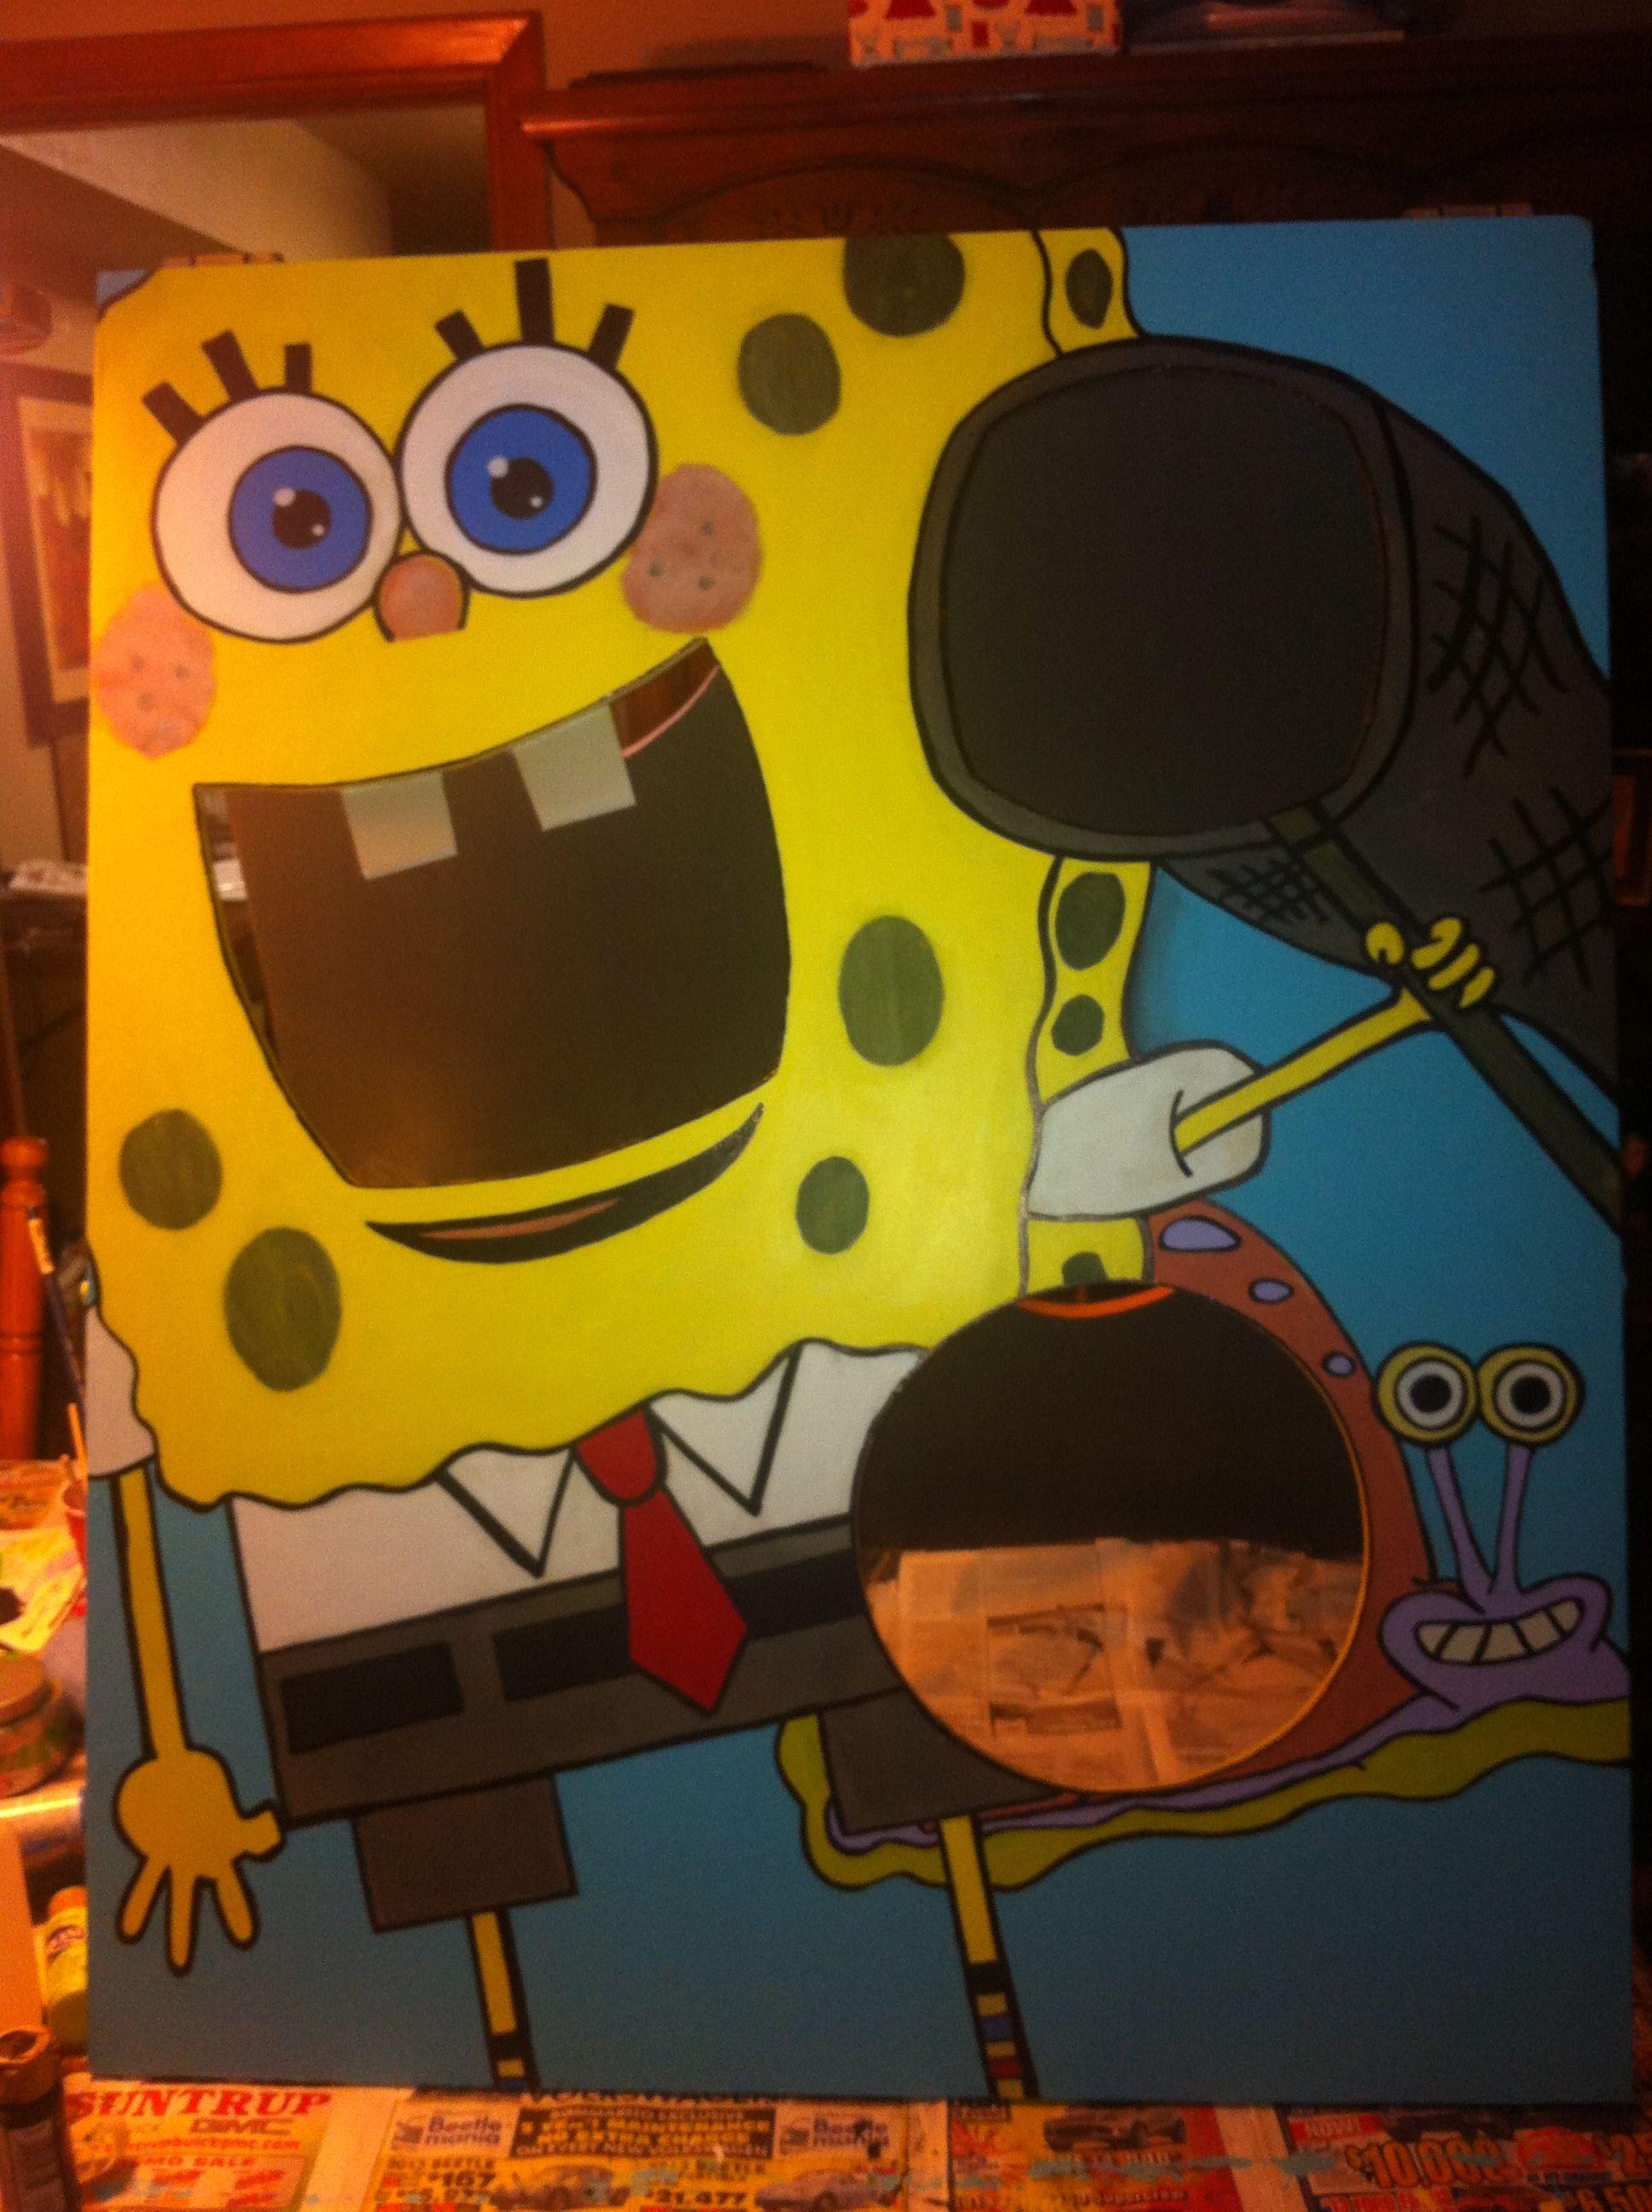 My Spongebob Bean Bag Toss Game Game Creation Lukas 6